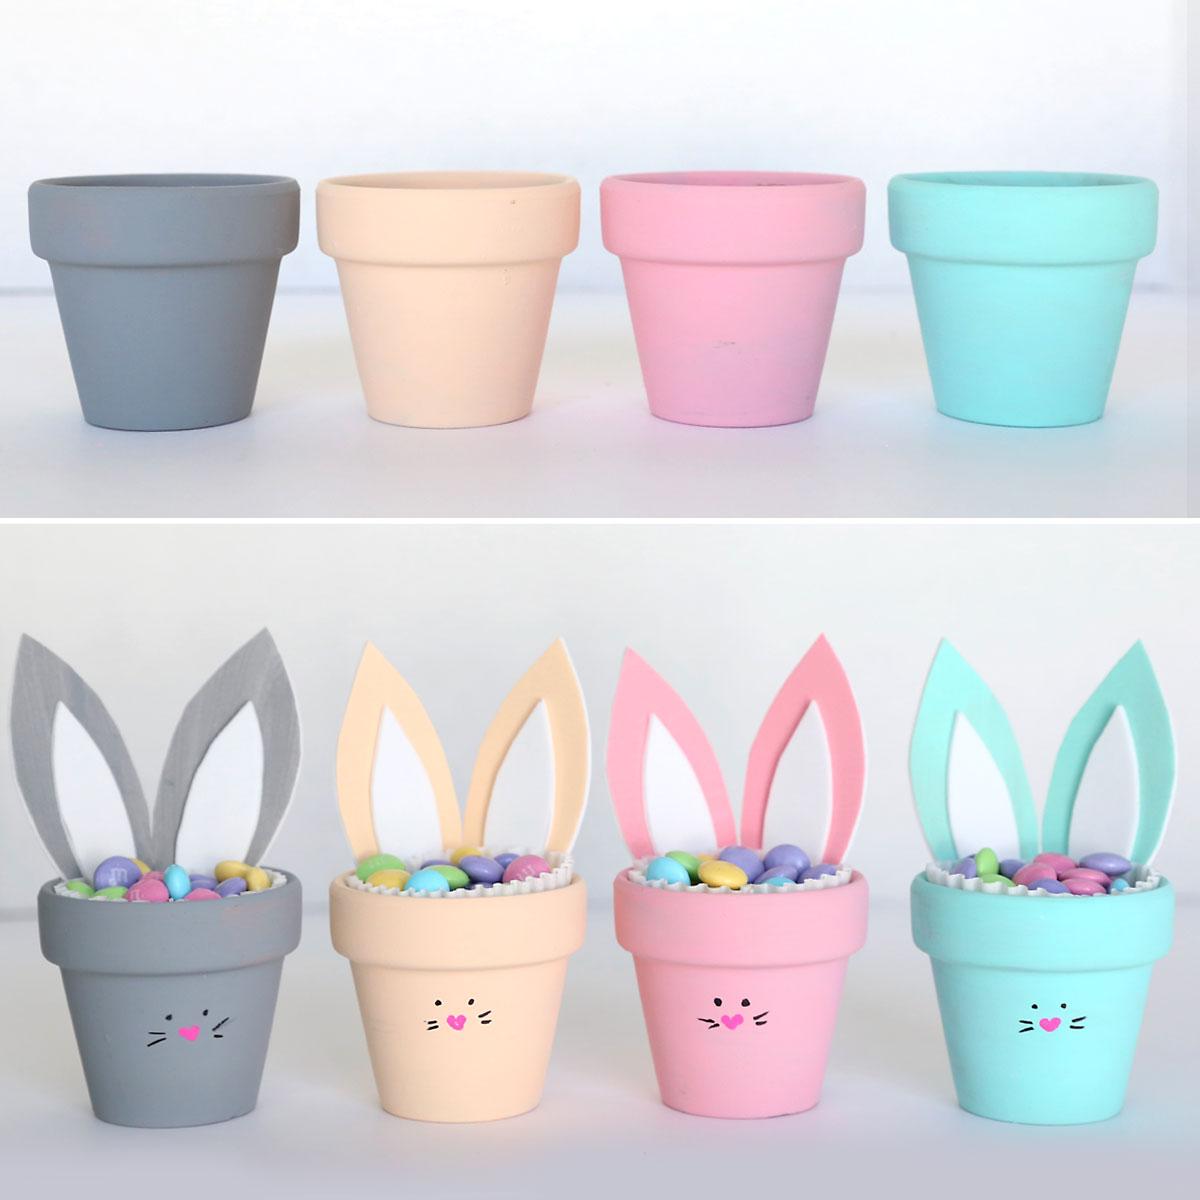 Four mini flower pots painted different colors; pots decorated as bunnies